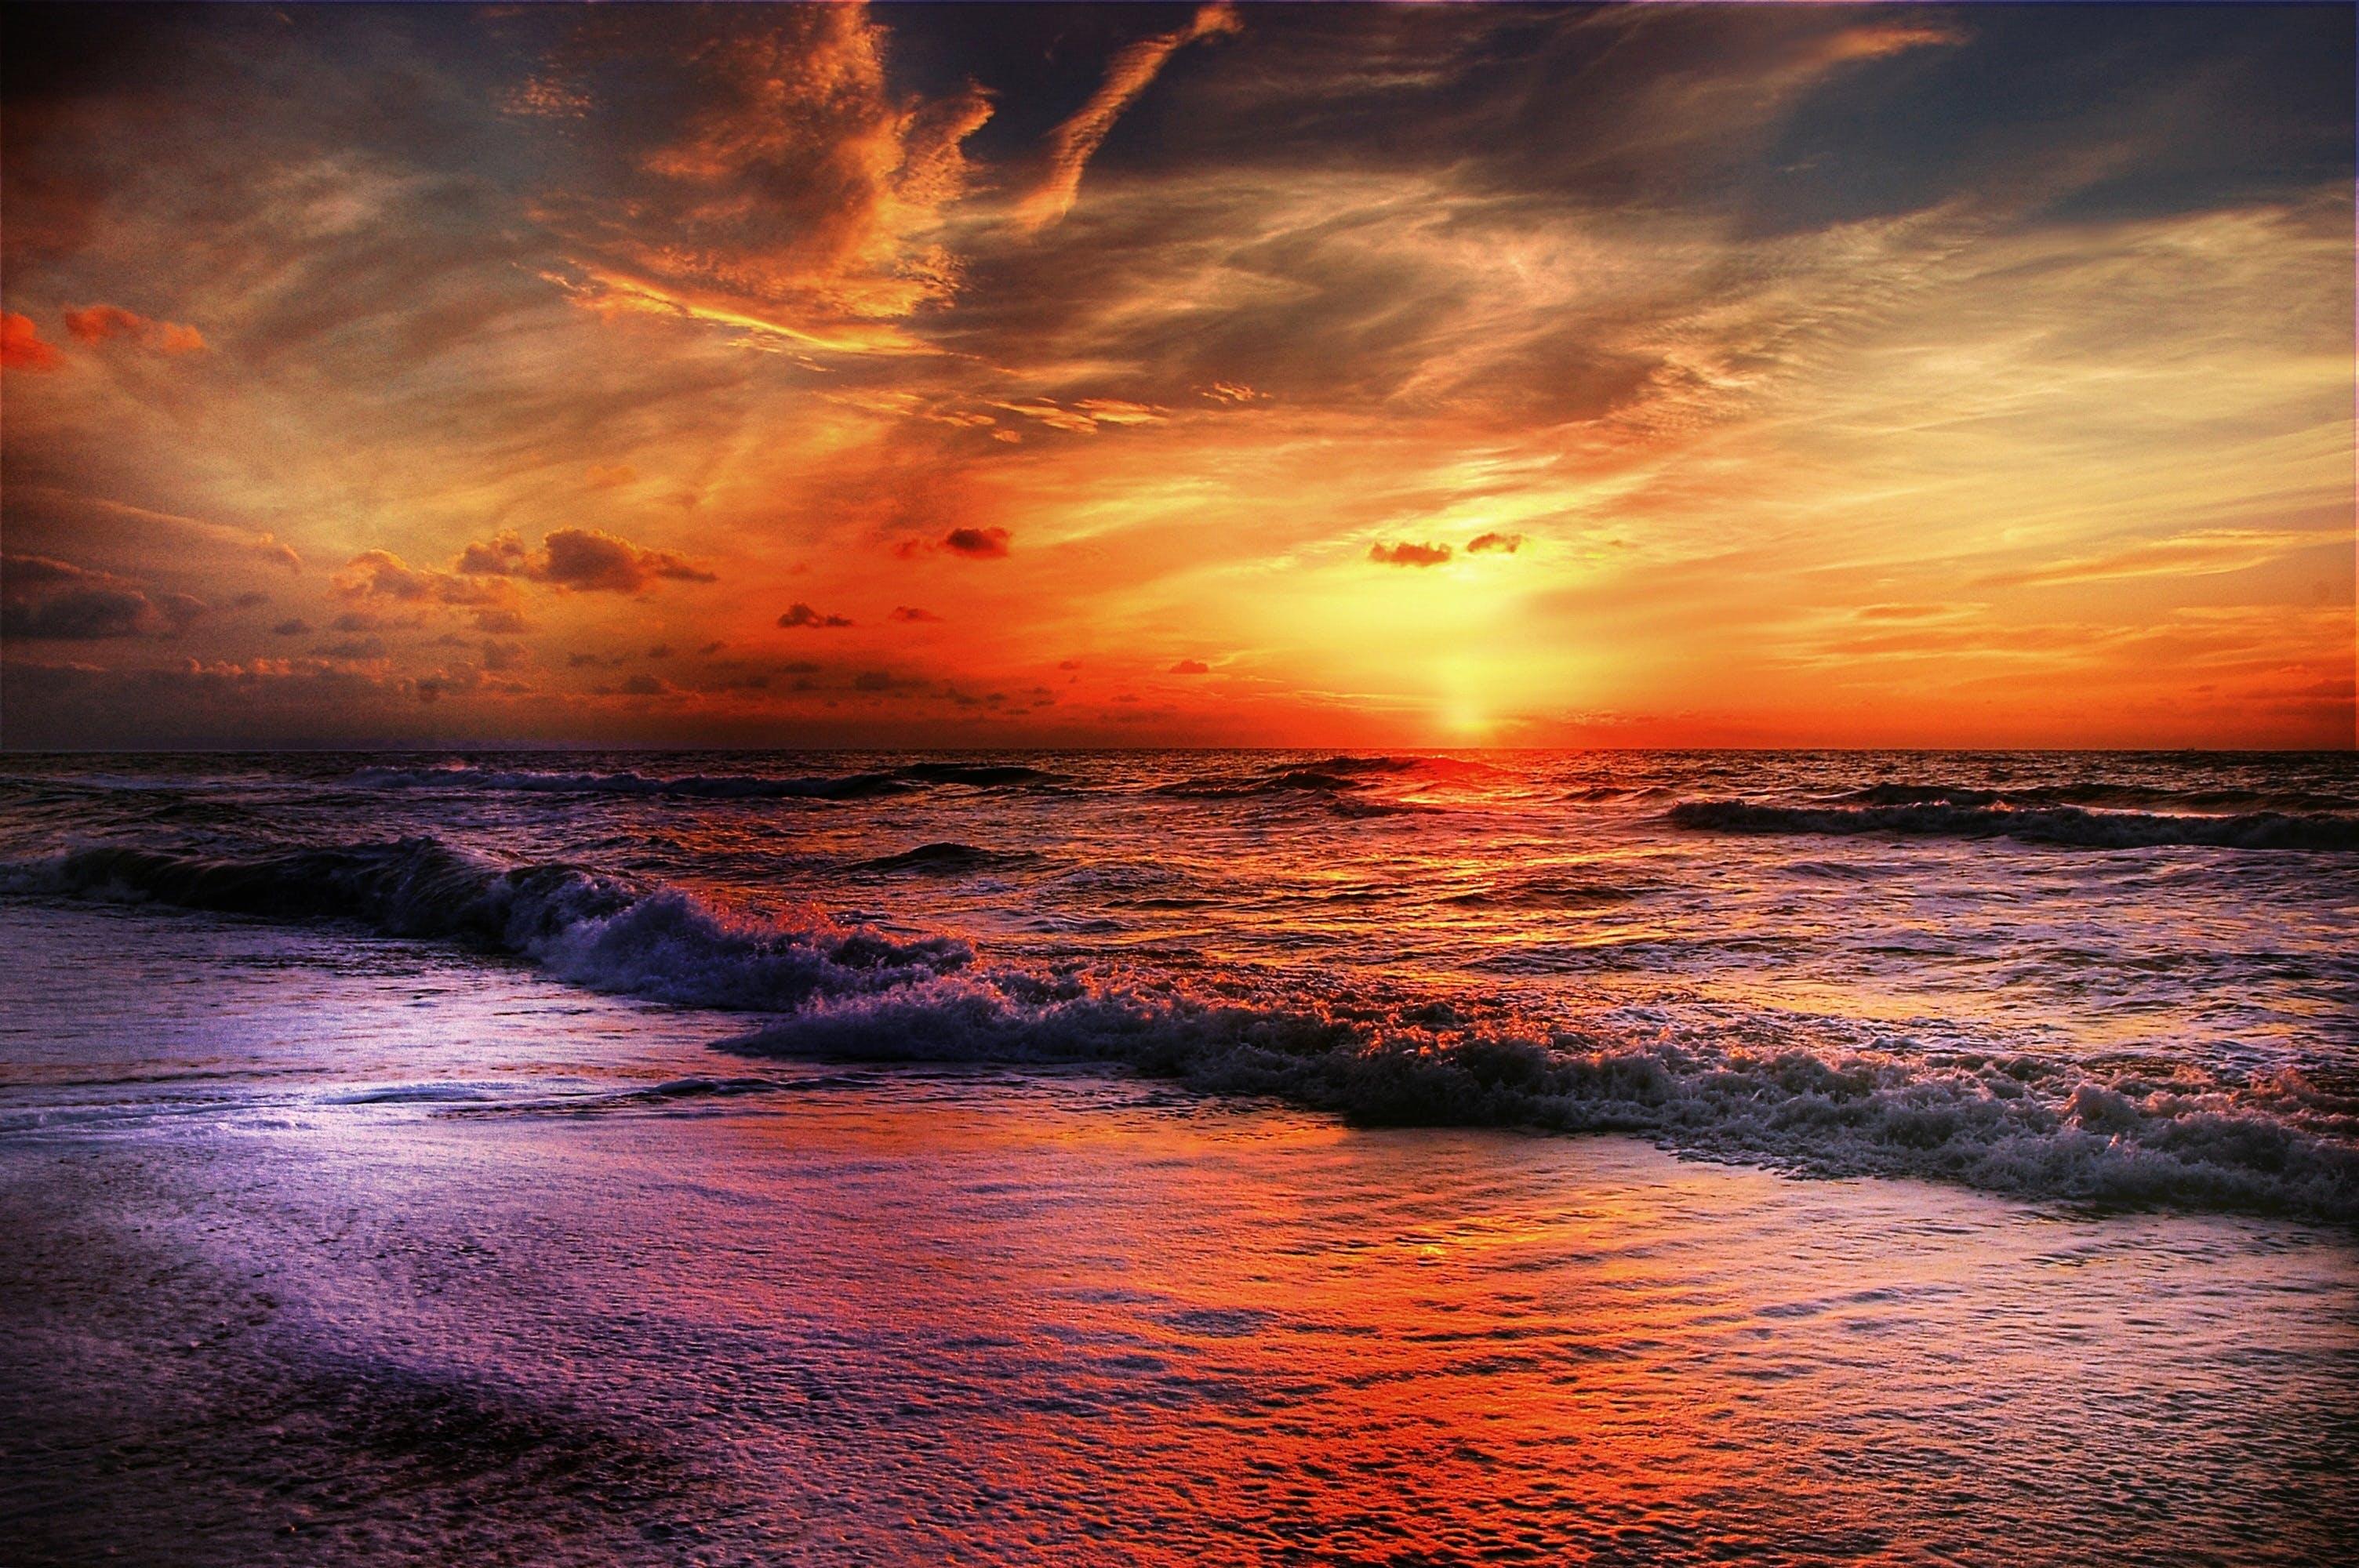 Seashore Under Orange Cloudy Sky